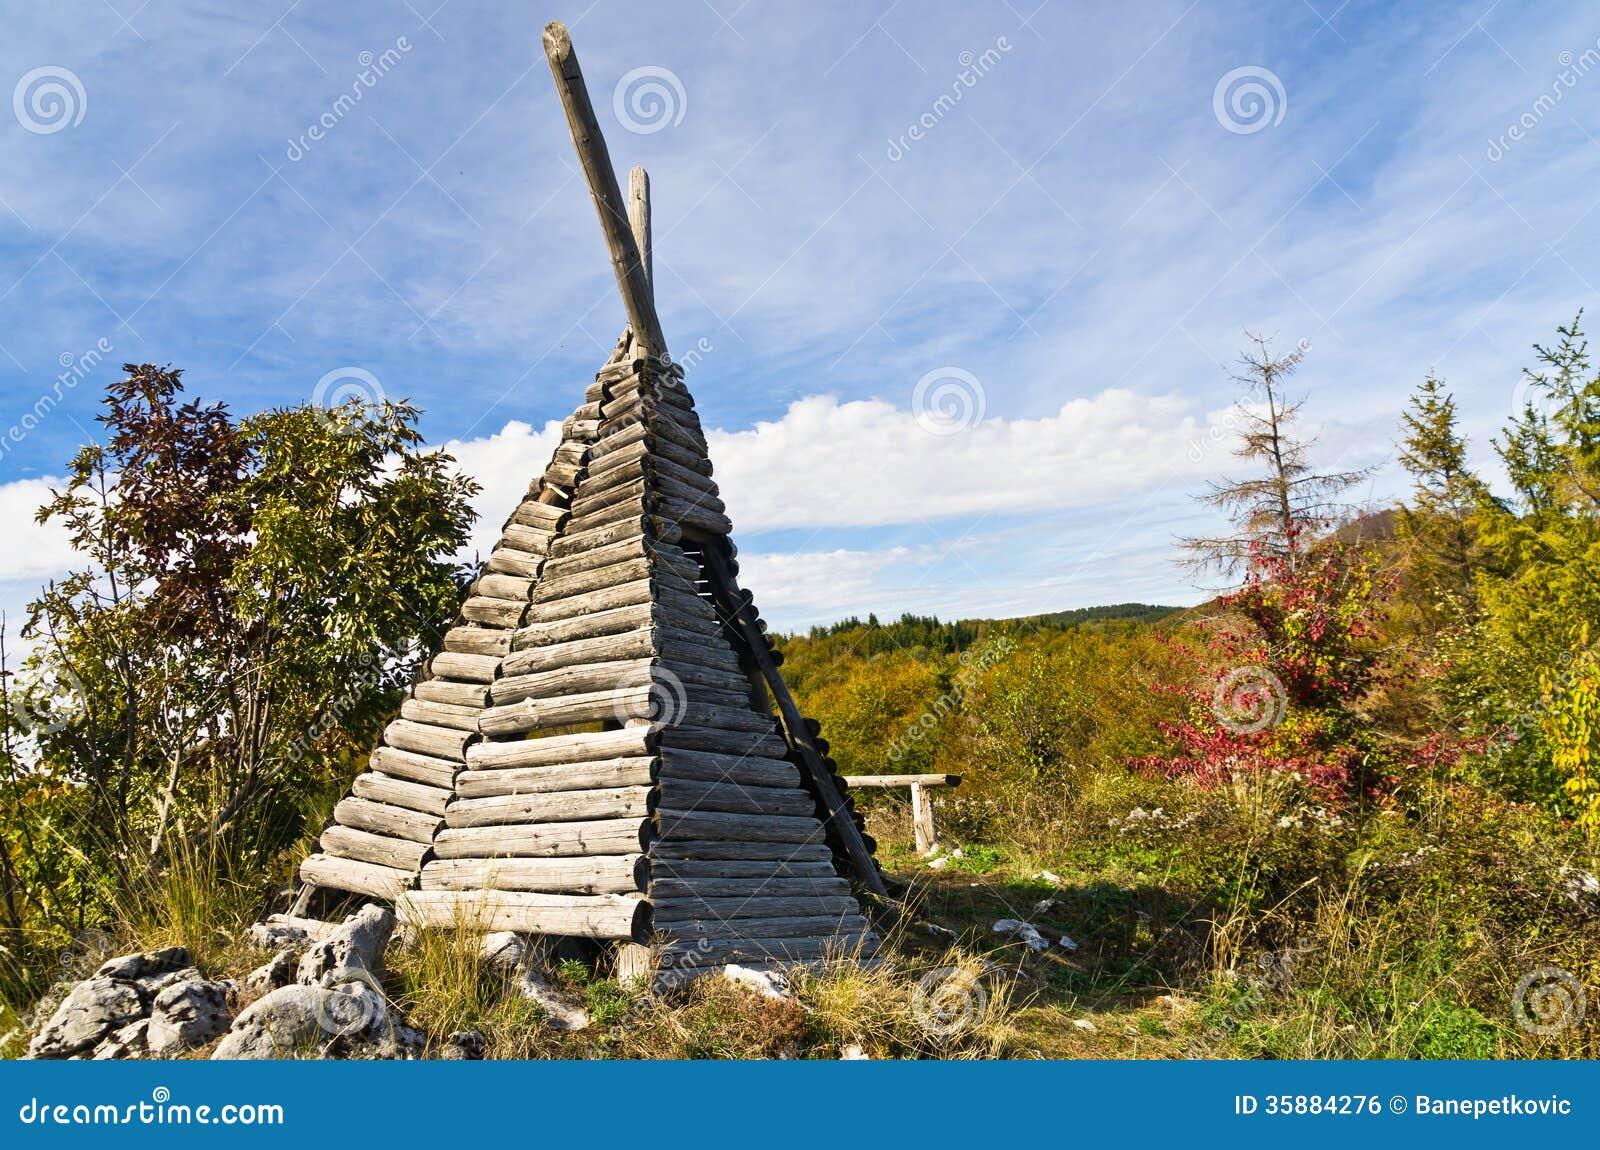 Small shepherd s hut on mount Bobija like a tent but made of wood. South serbia. & Small Shepherdu0027s Hut On Mount Bobija Like A Tent But Made Of Wood ...